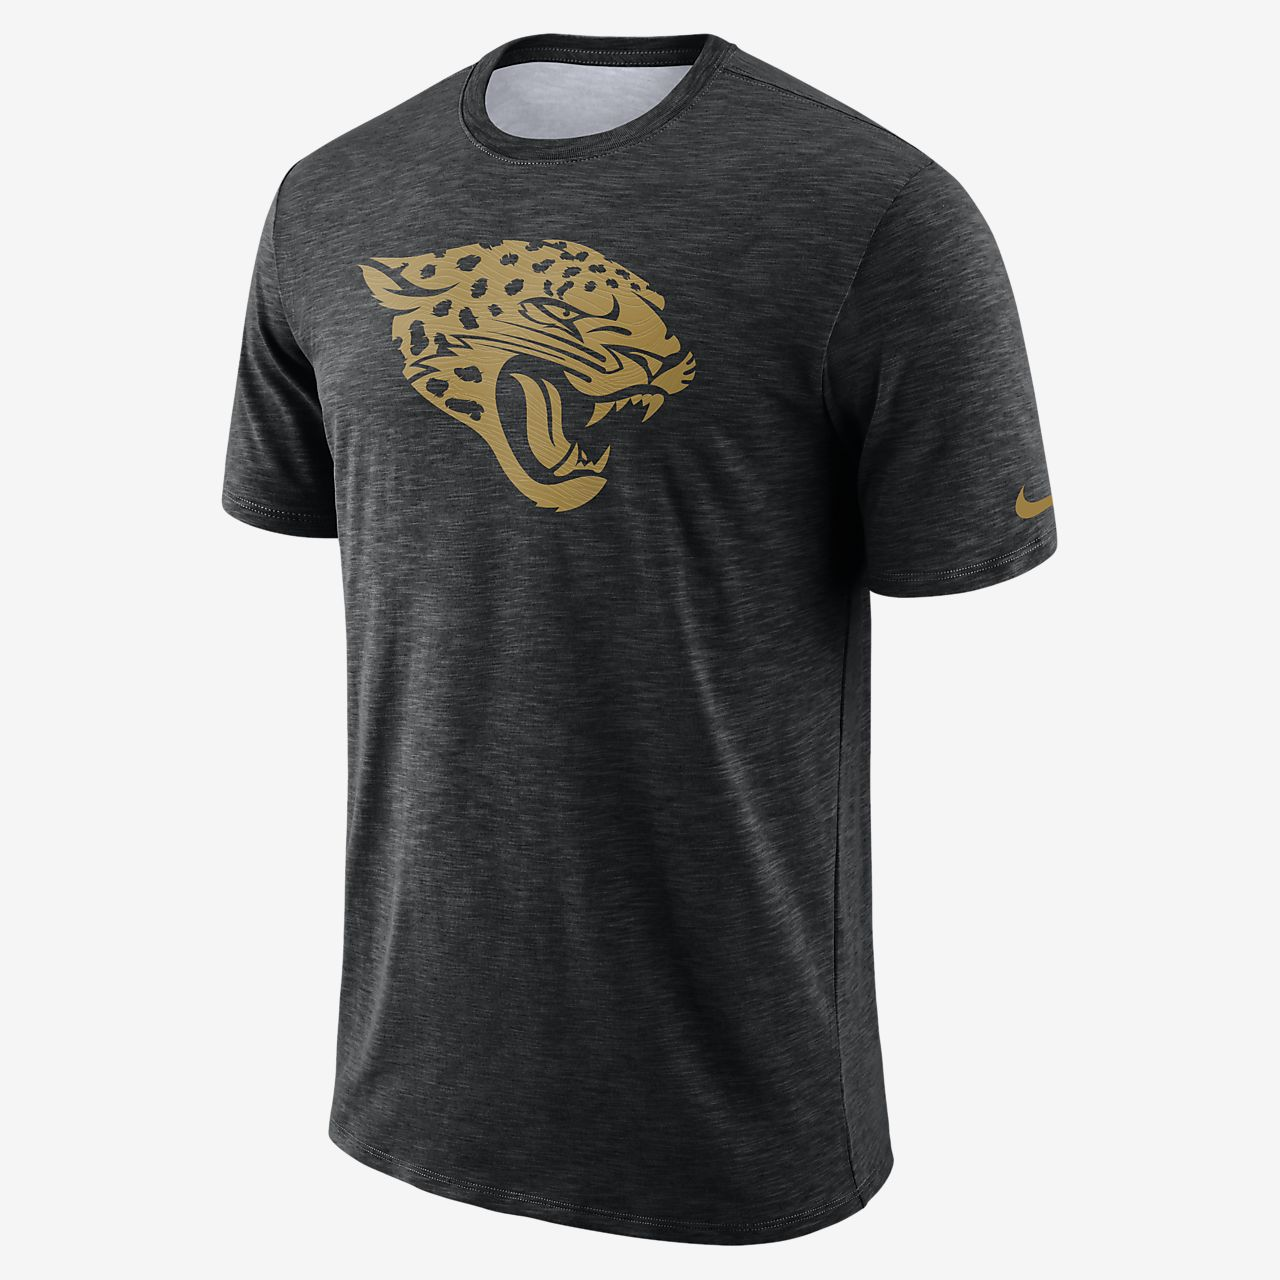 Colours New Nike Women/'s Dri-Fit Running Miller T-Shirt Various Sizes